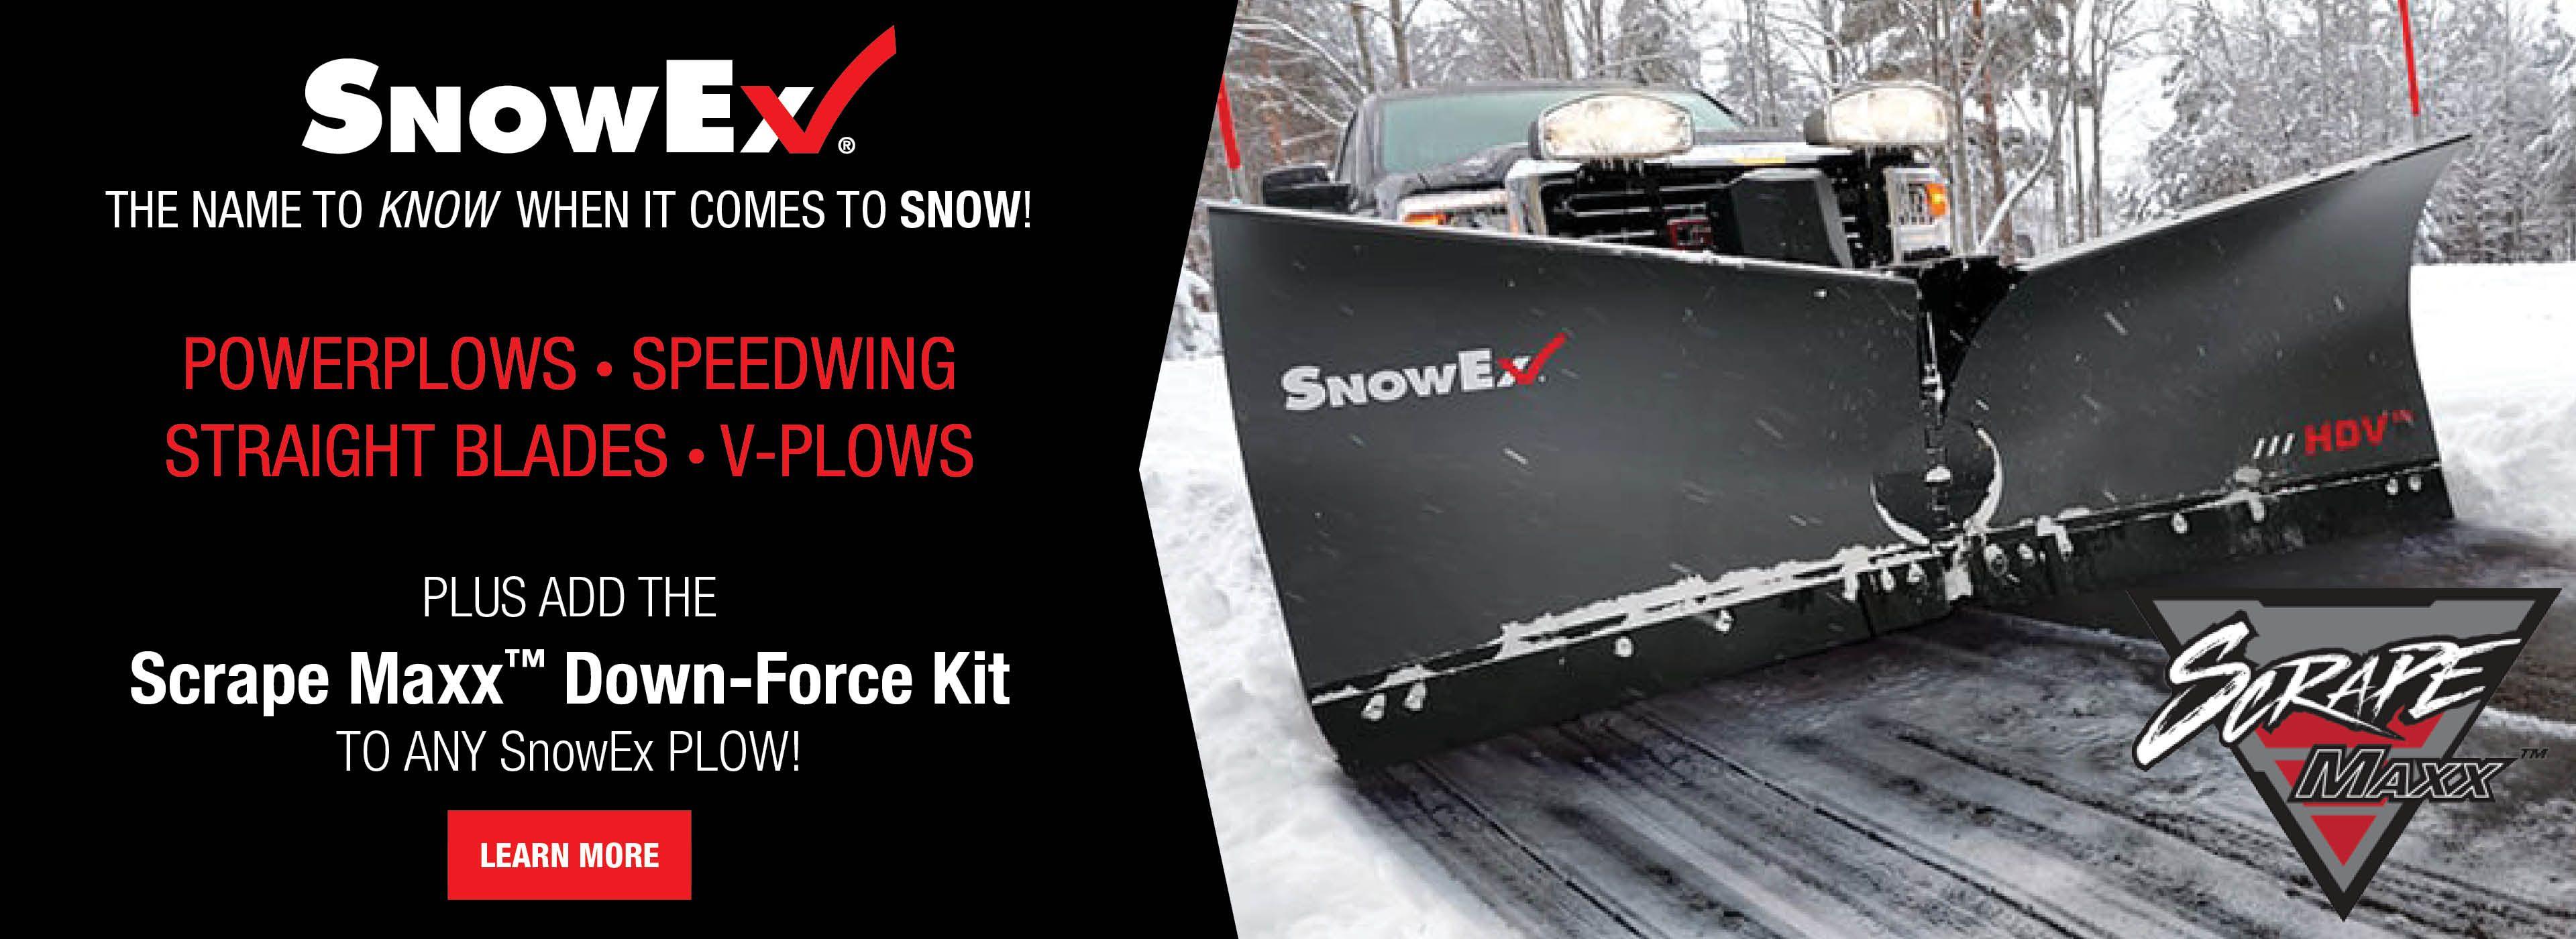 SnowEx Scrape Maxx